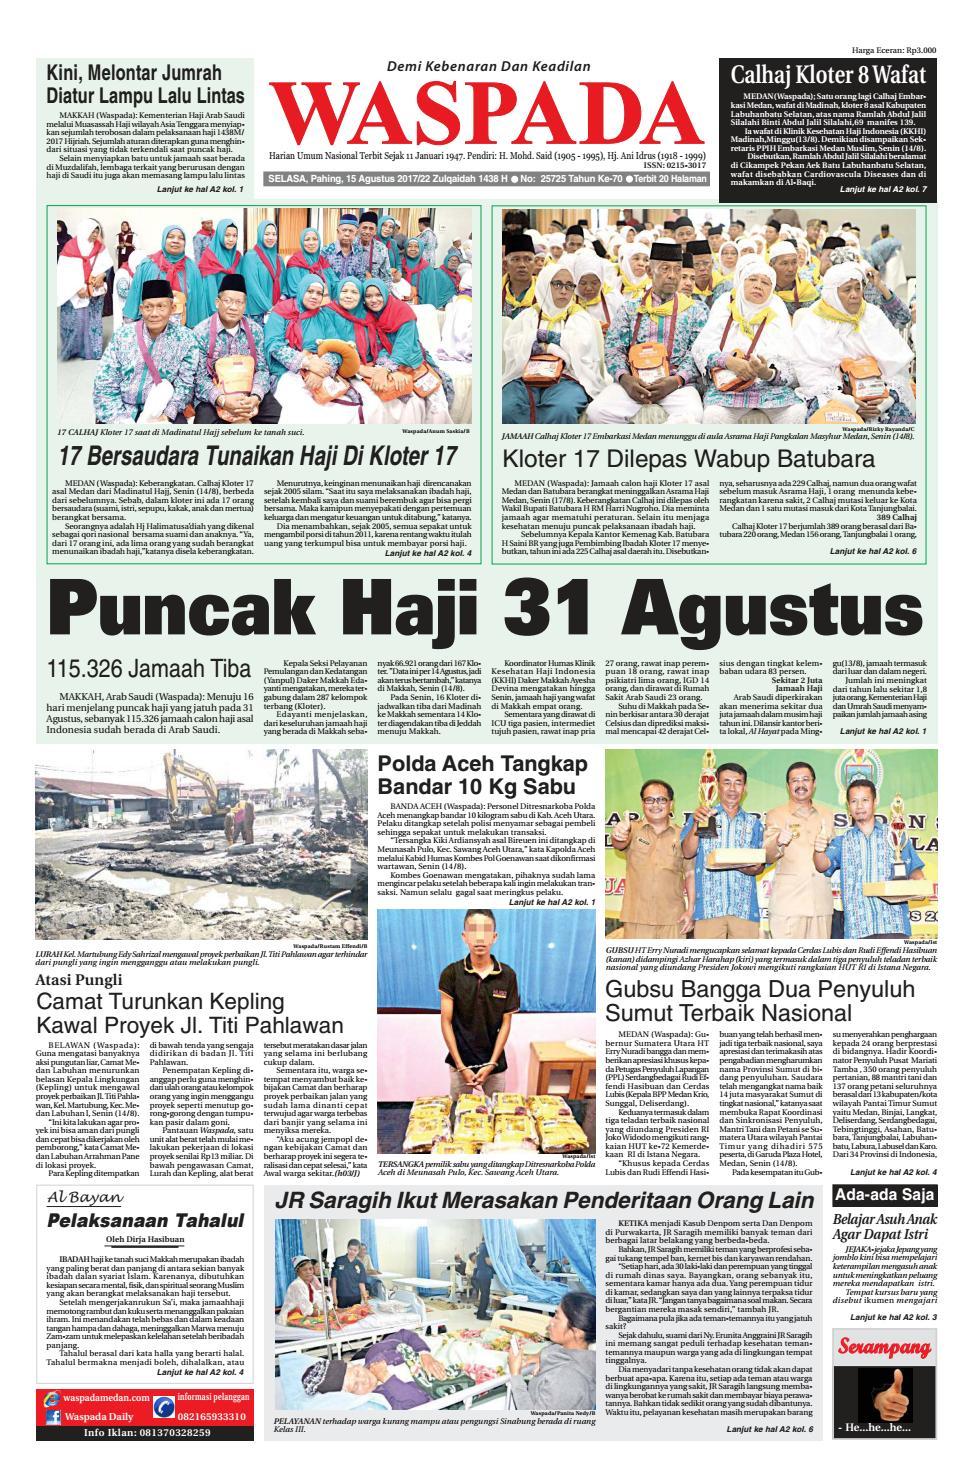 Waspada Selasa 15 Agustus 2017 By Harian Issuu Rejeki Anak Soleh 3 Voucher Carrefour Rp 200000